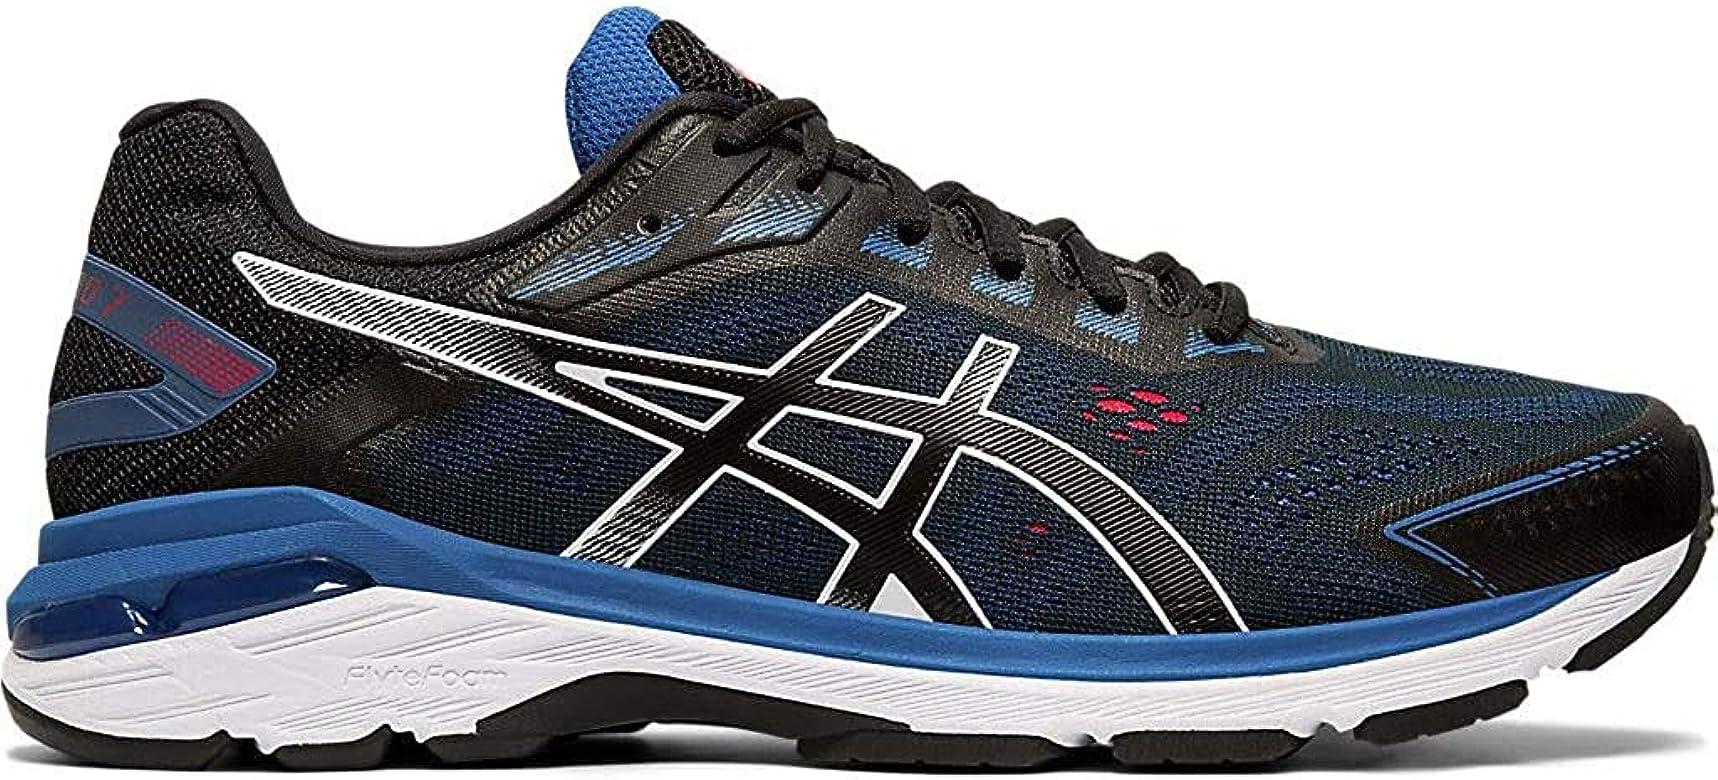 ASICS GT-2000 7 Mens Running Shoes: Amazon.es: Zapatos y complementos